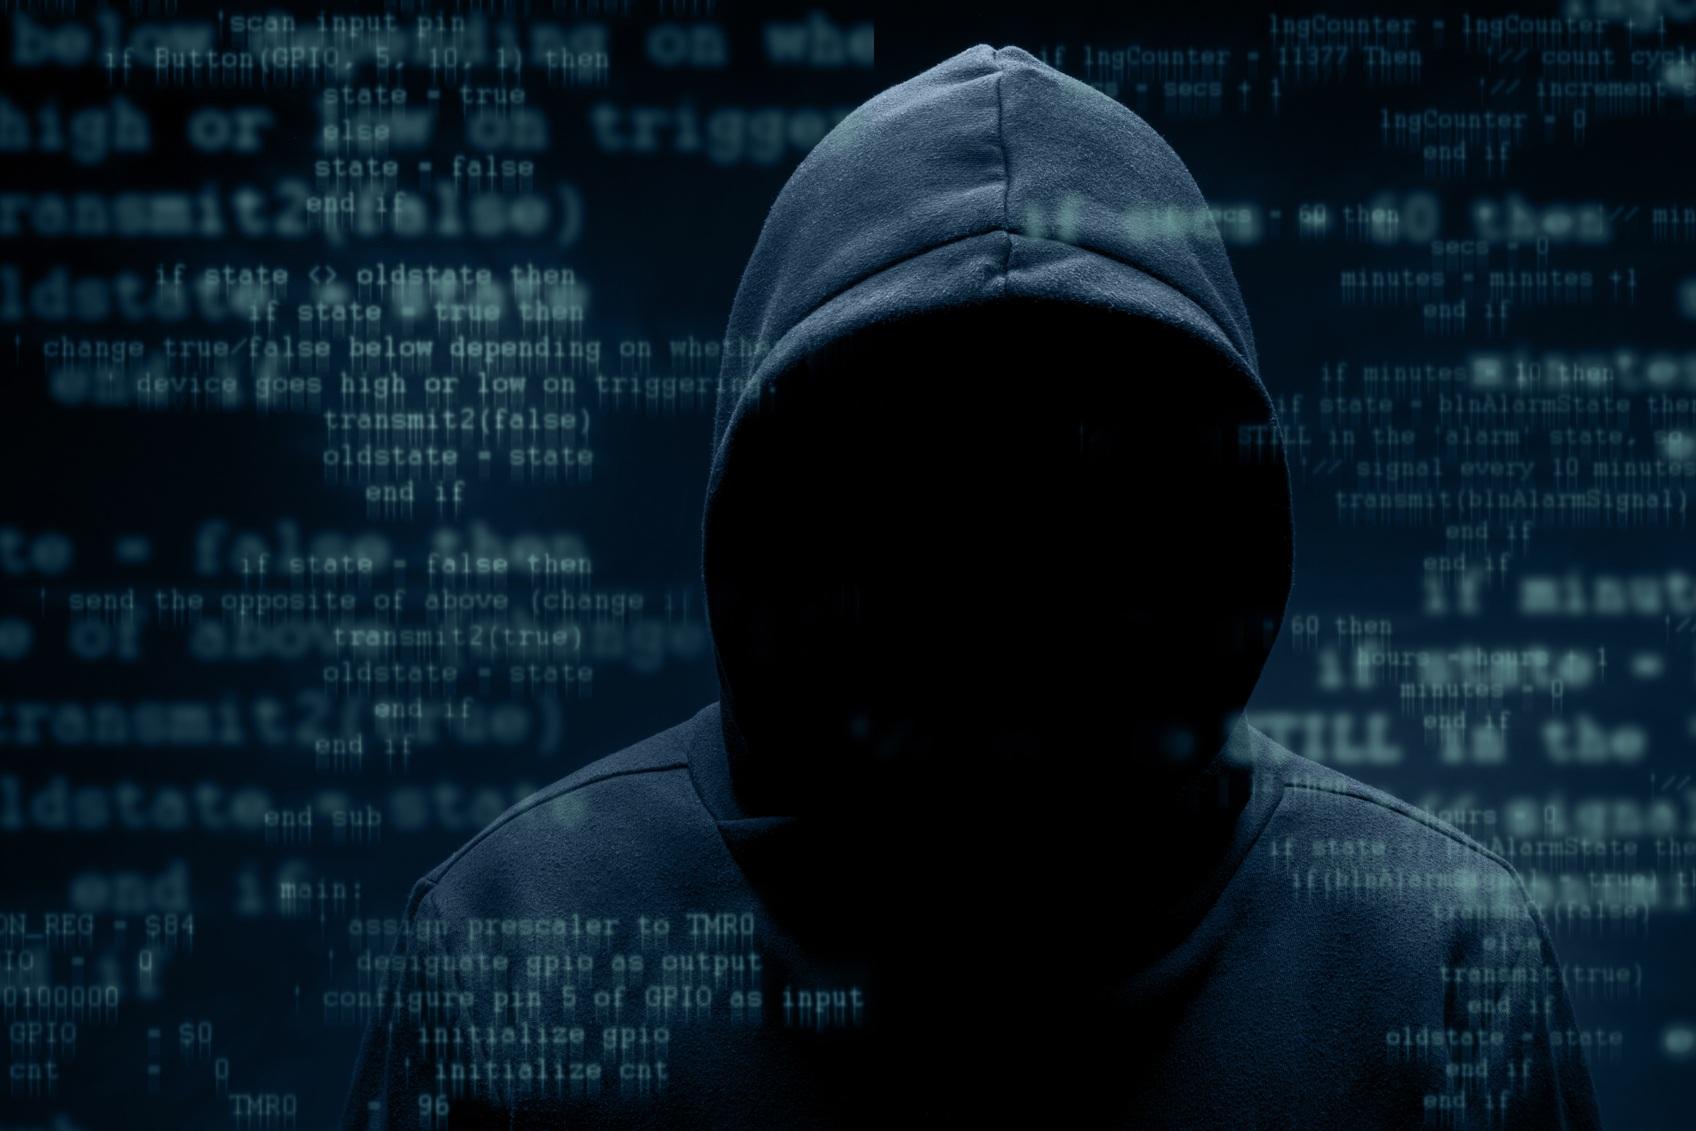 Critical PHP vulnerability